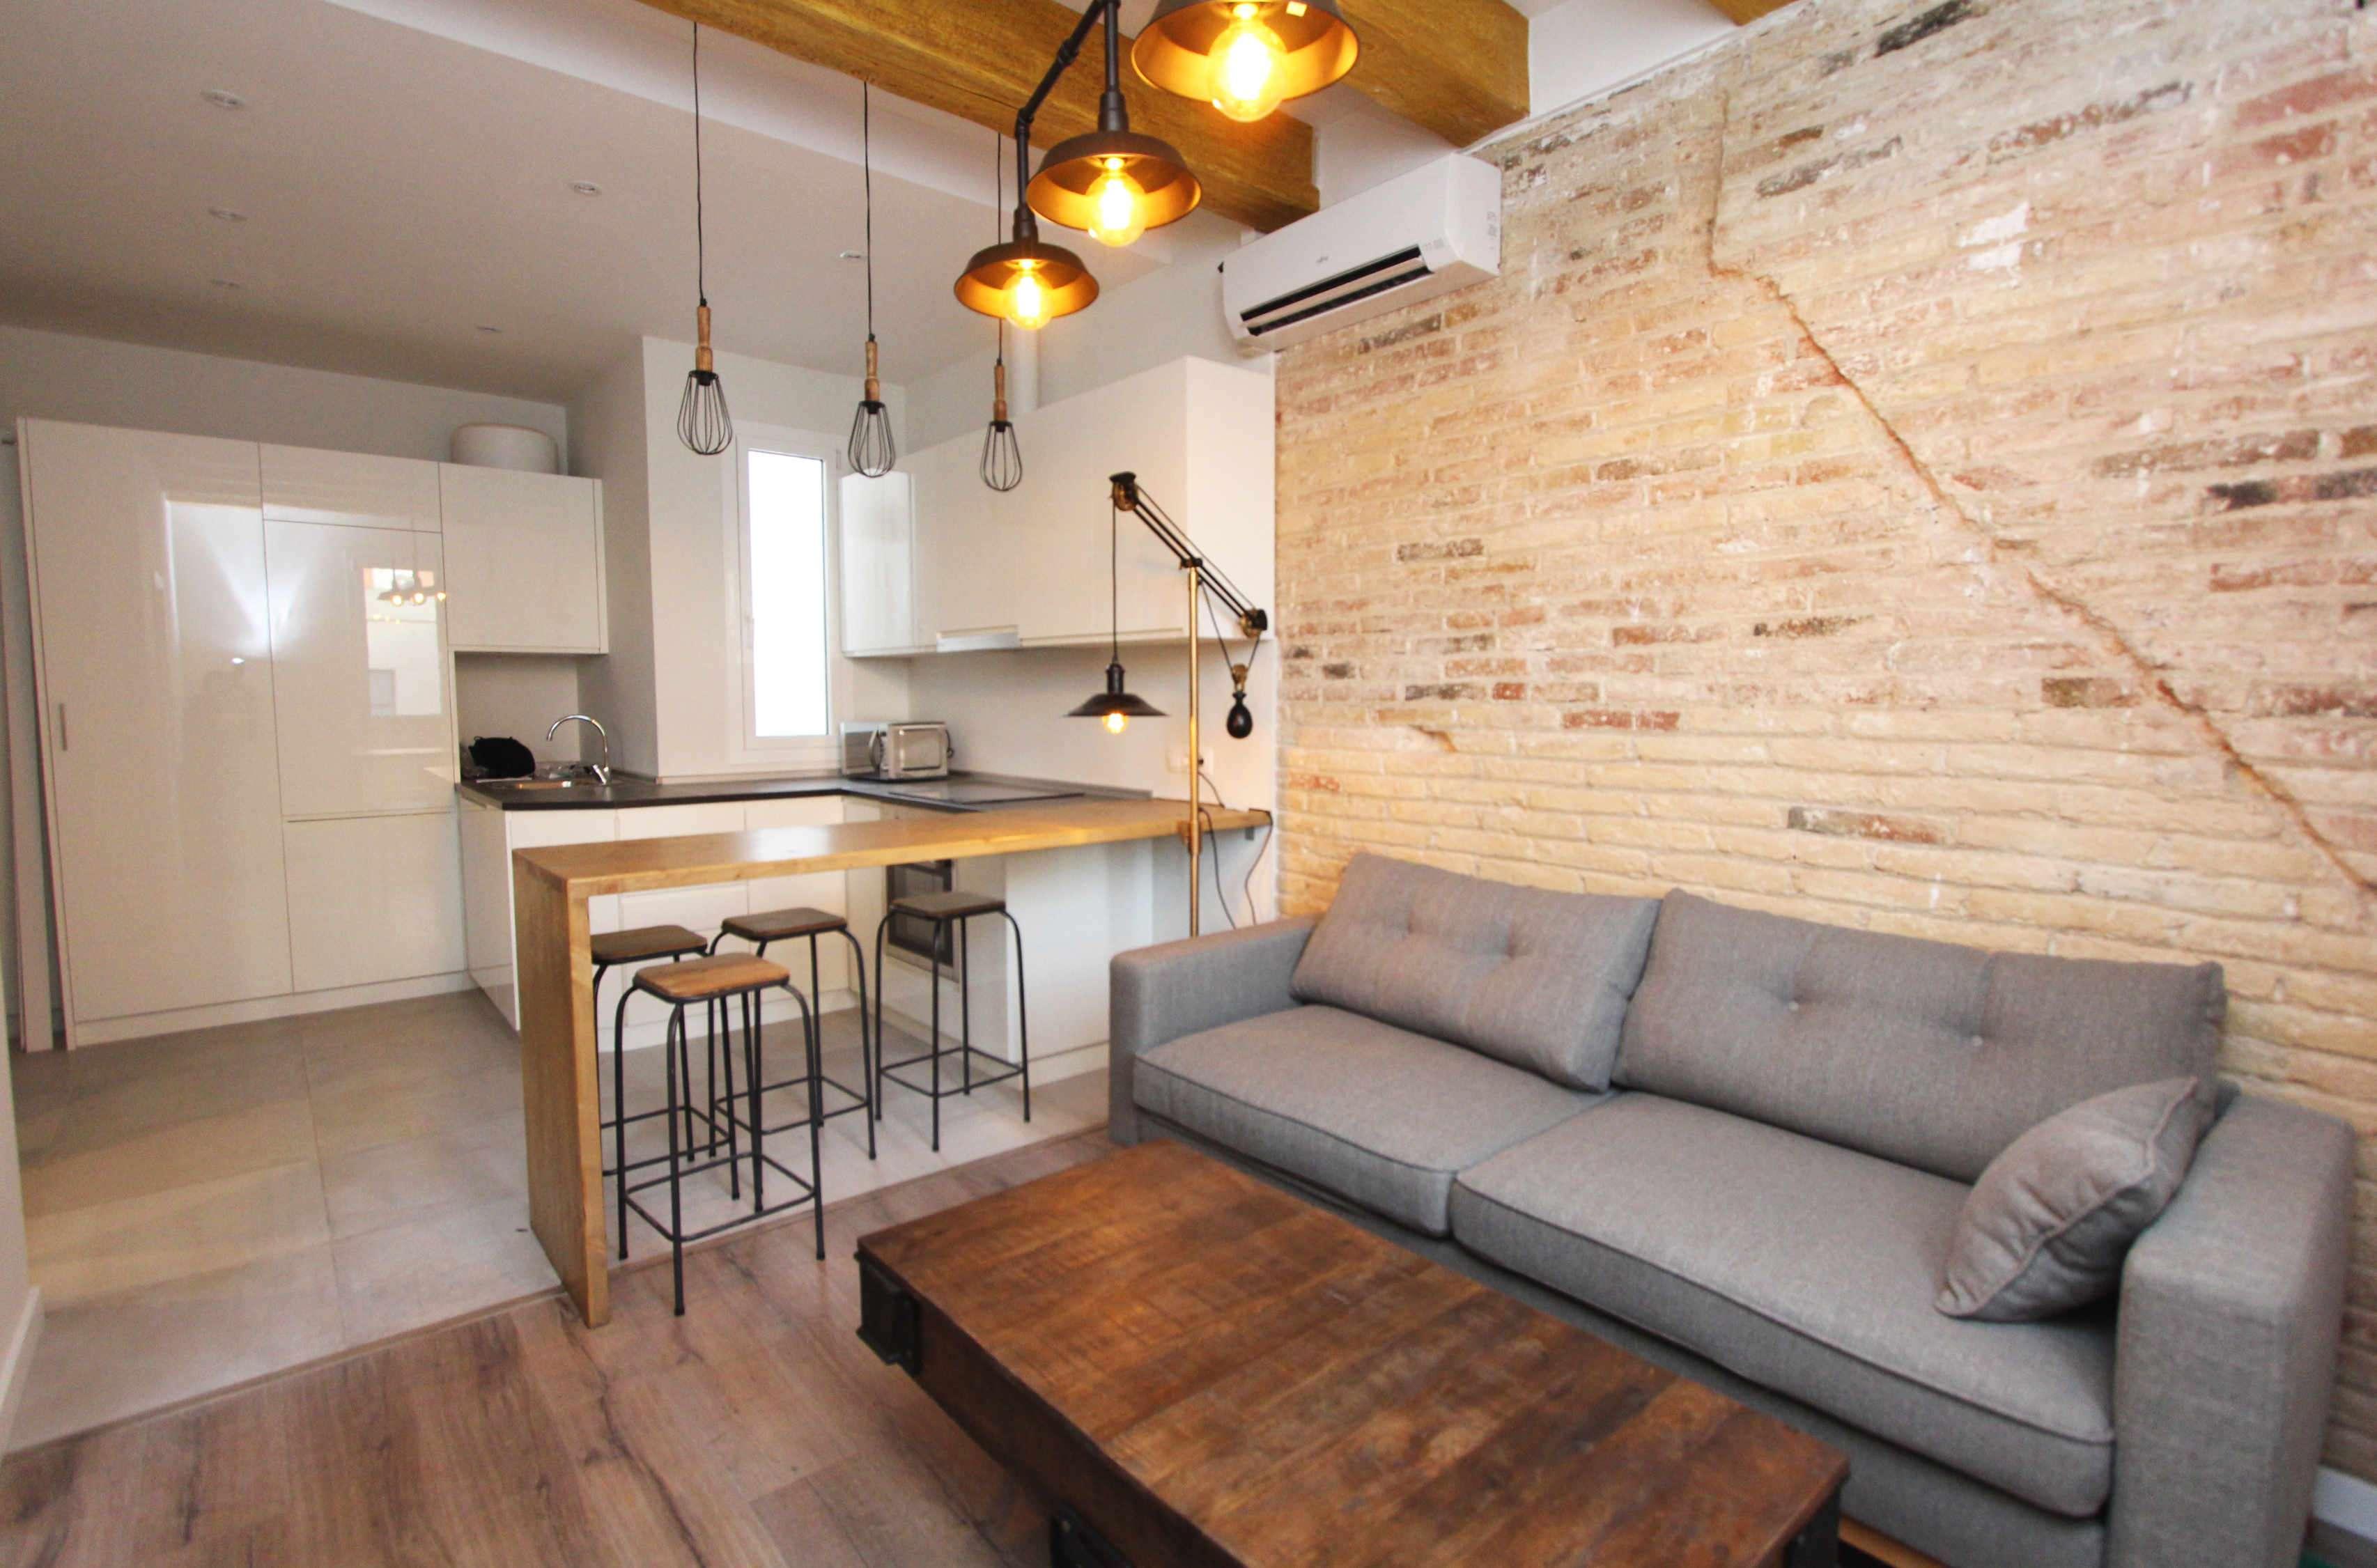 Квартира в индустриальном стиле в районе Саграда Фамилии